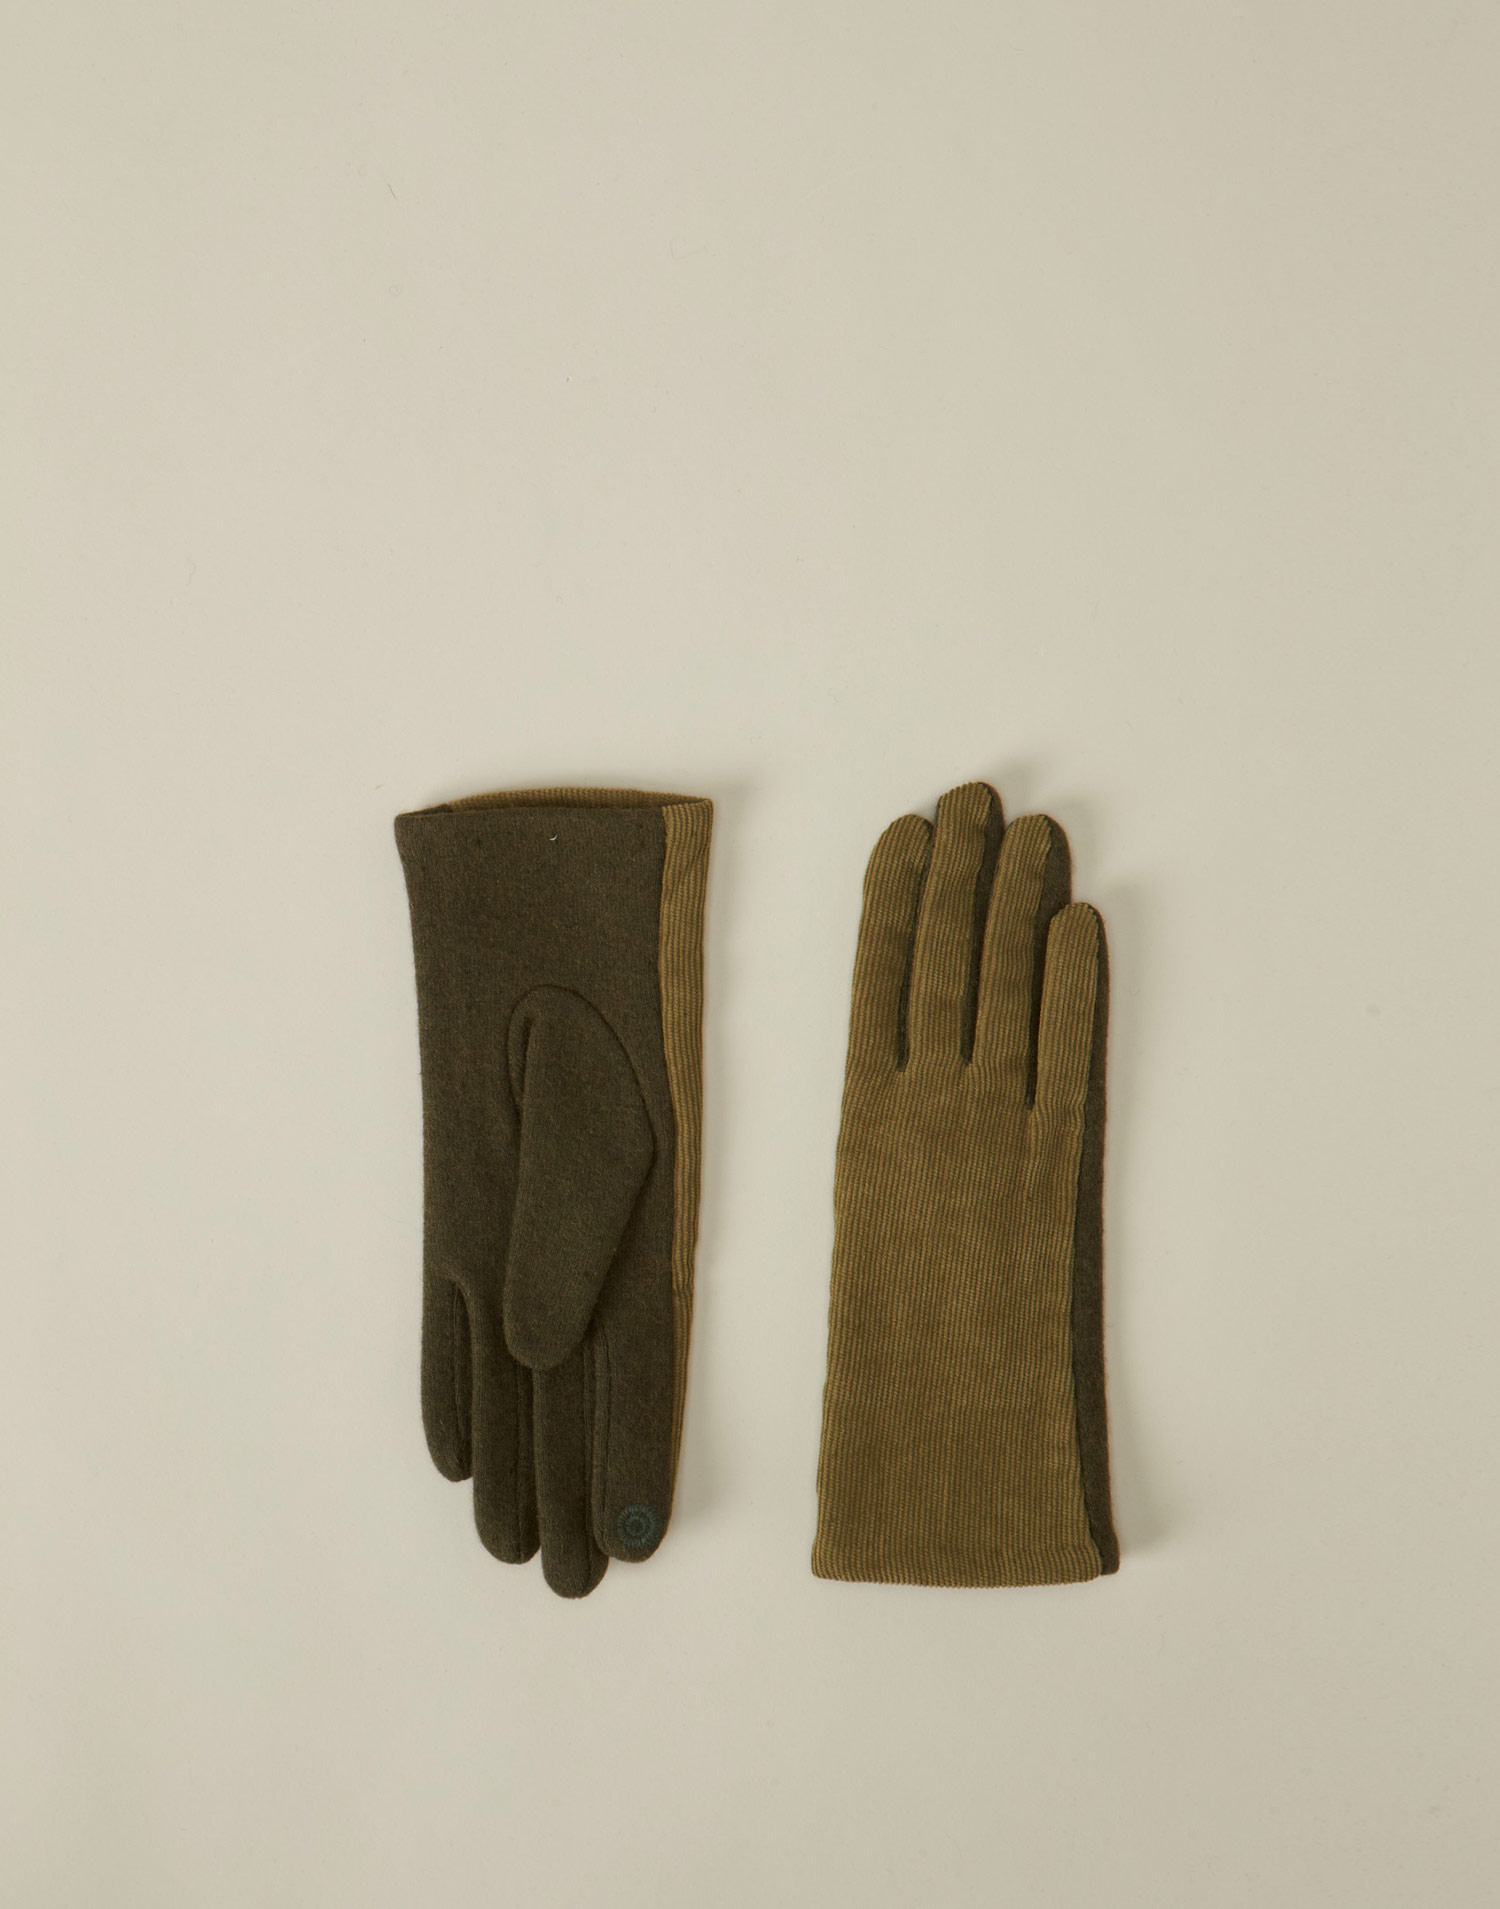 Corduroy woolen tech glove